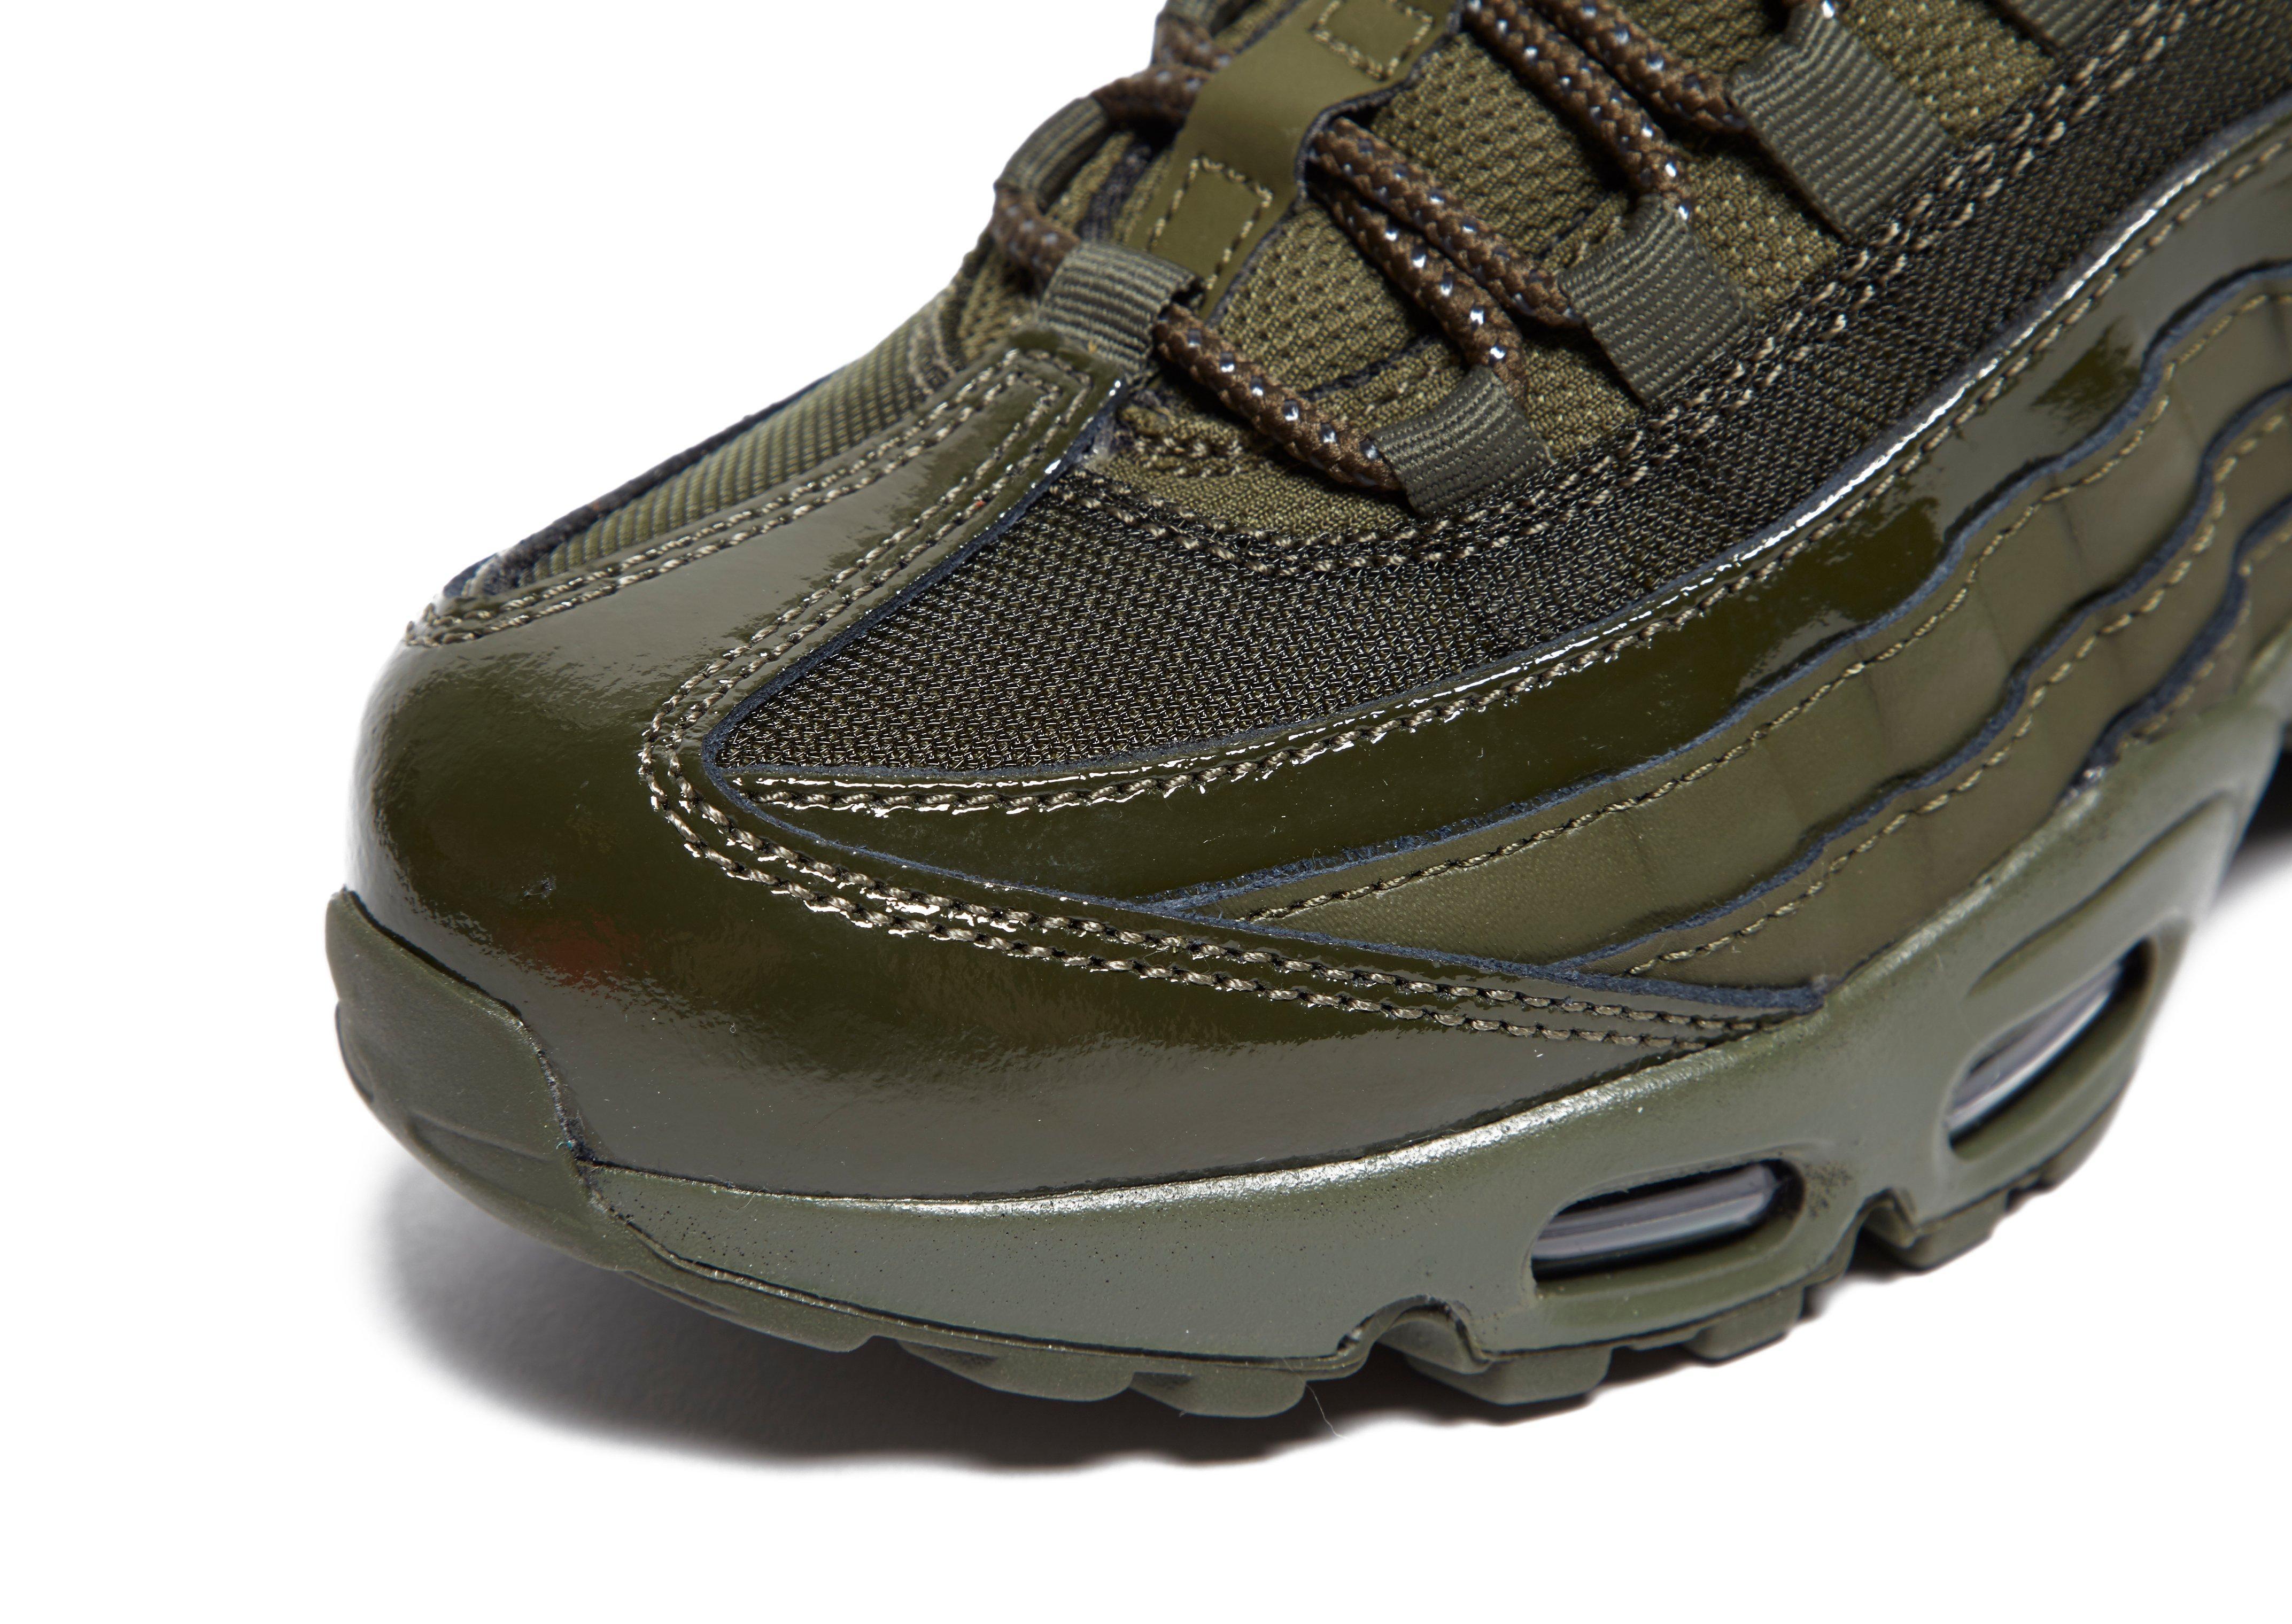 Nike Khaki Glossy Shoes